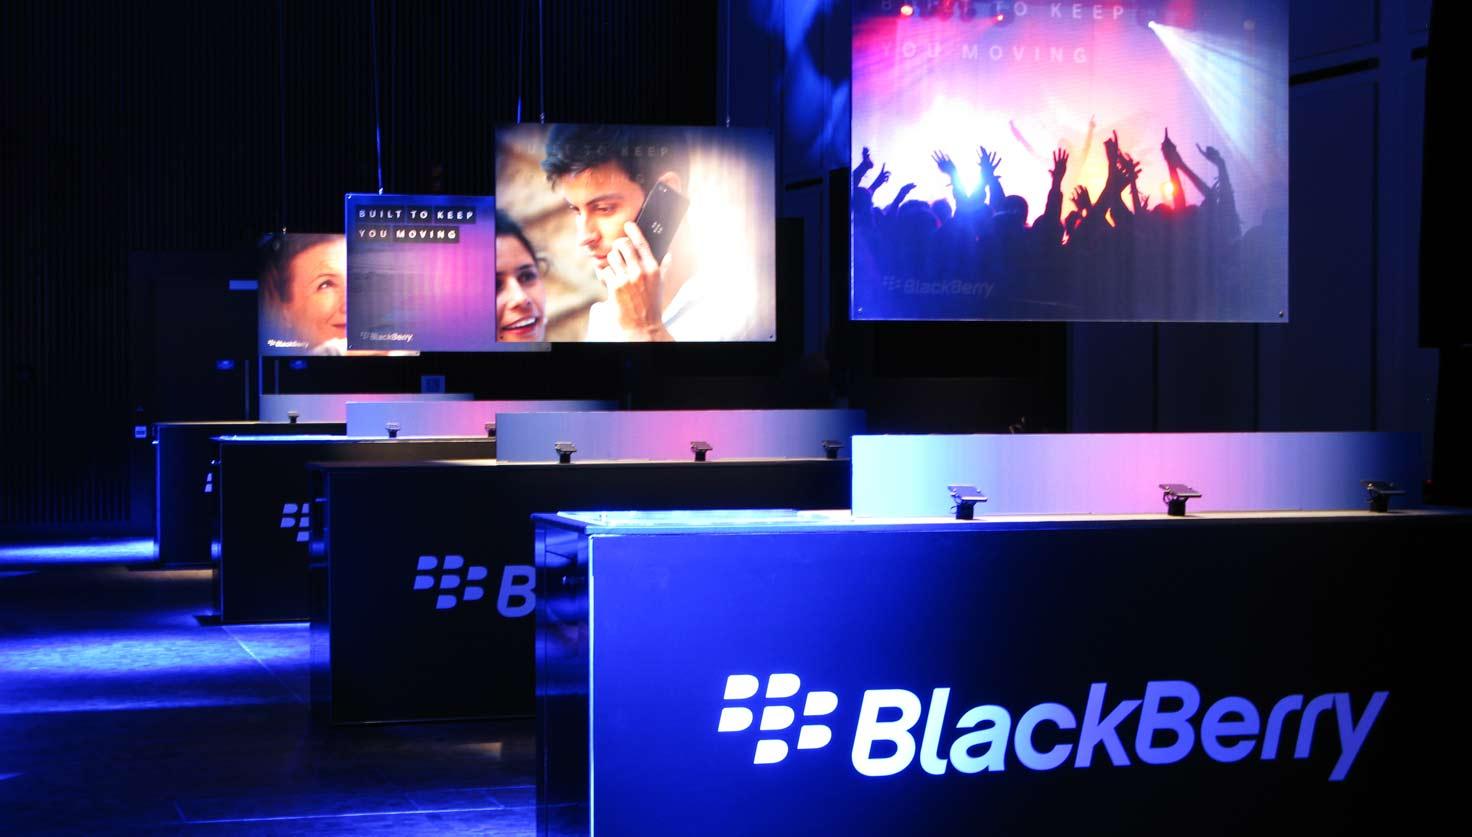 BlackBerry_Web_1.jpg